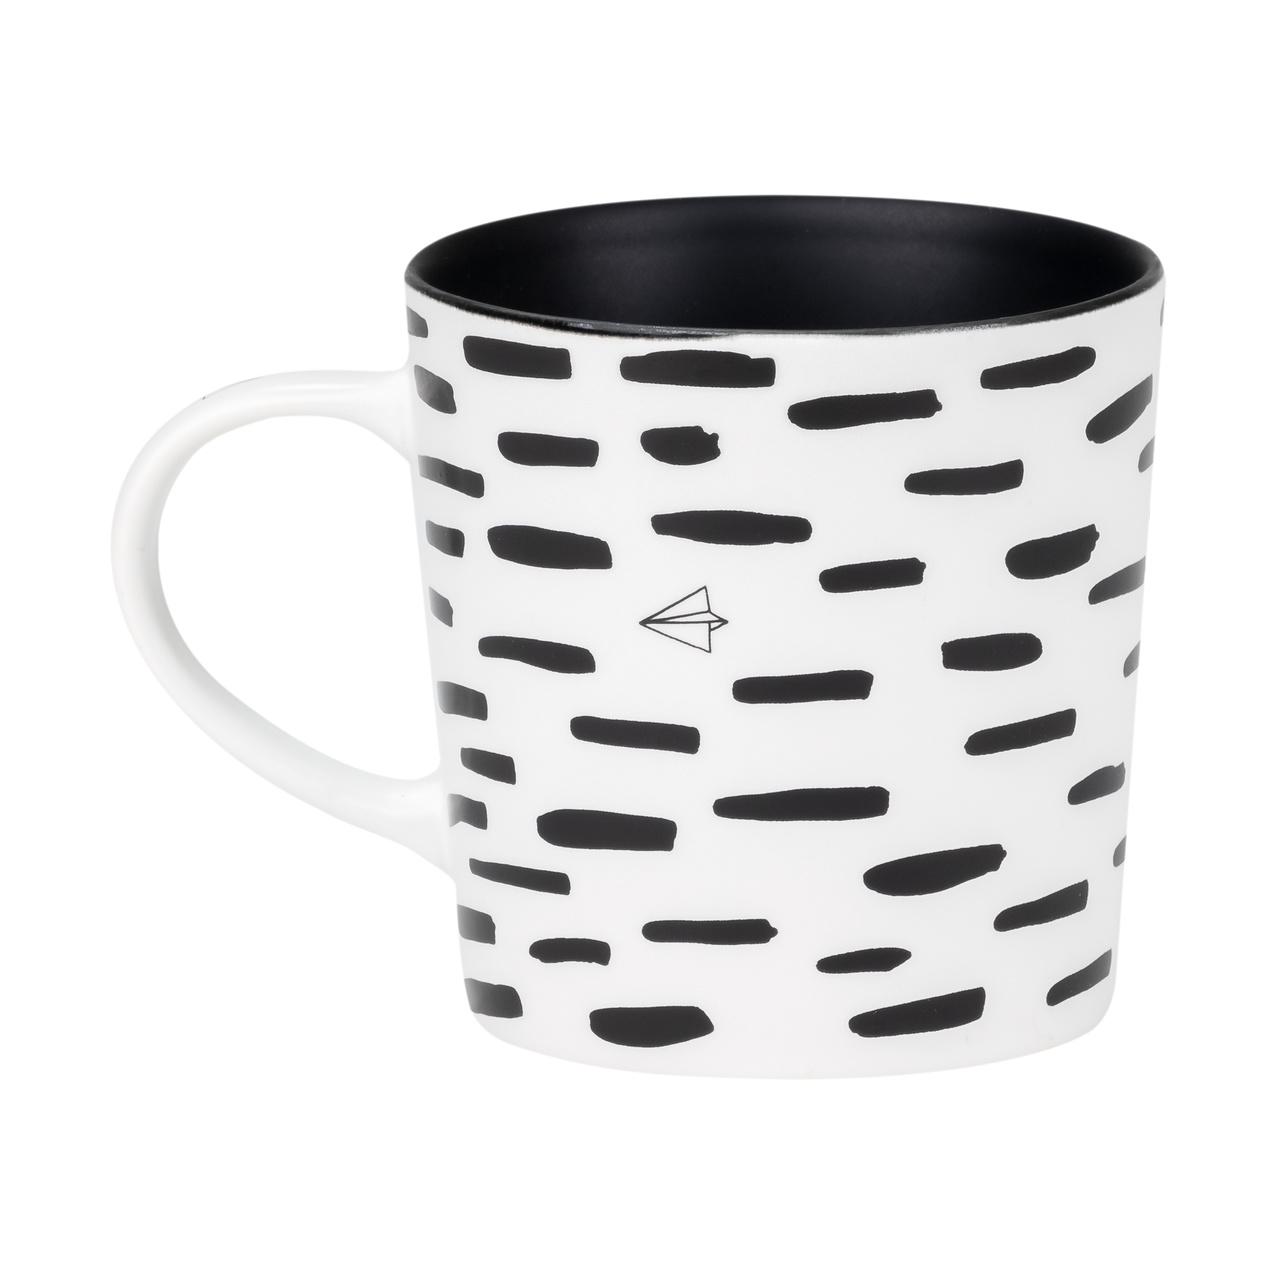 You Annoy Me the Least Mug